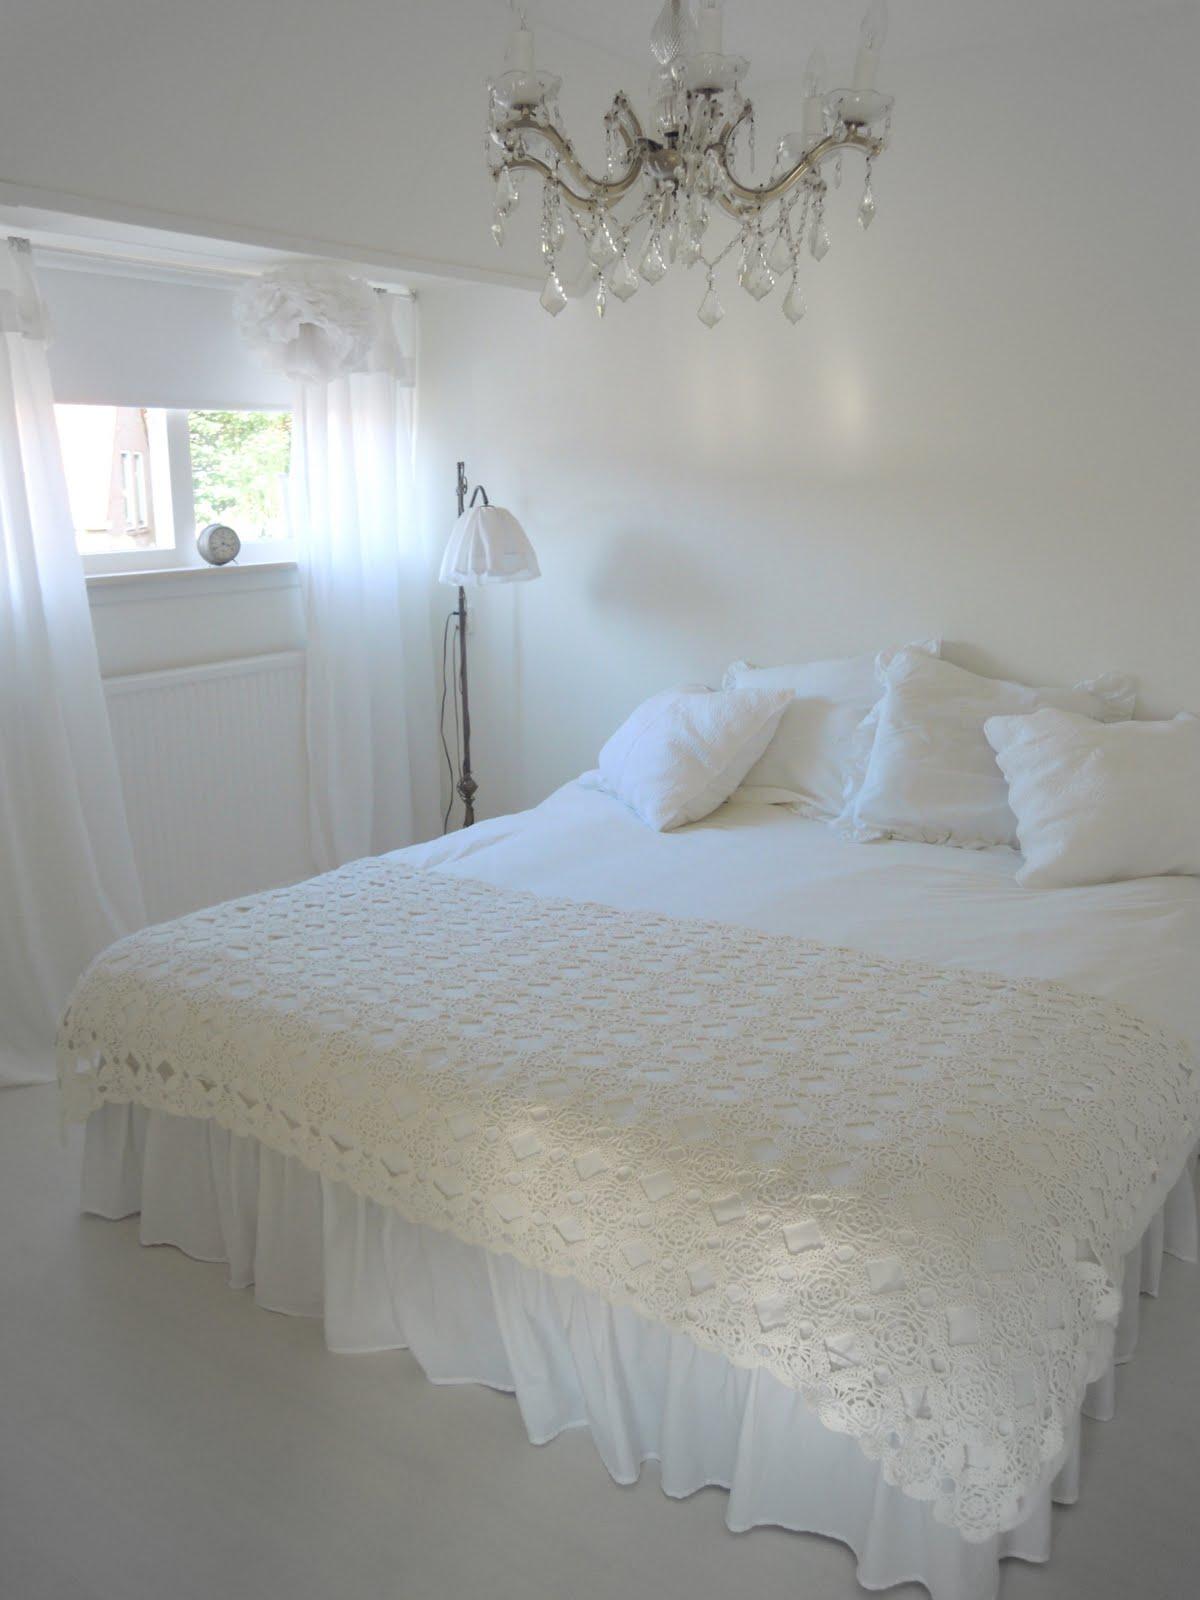 Kamer ontwerp baby ideas - Baby slaapkamer ...